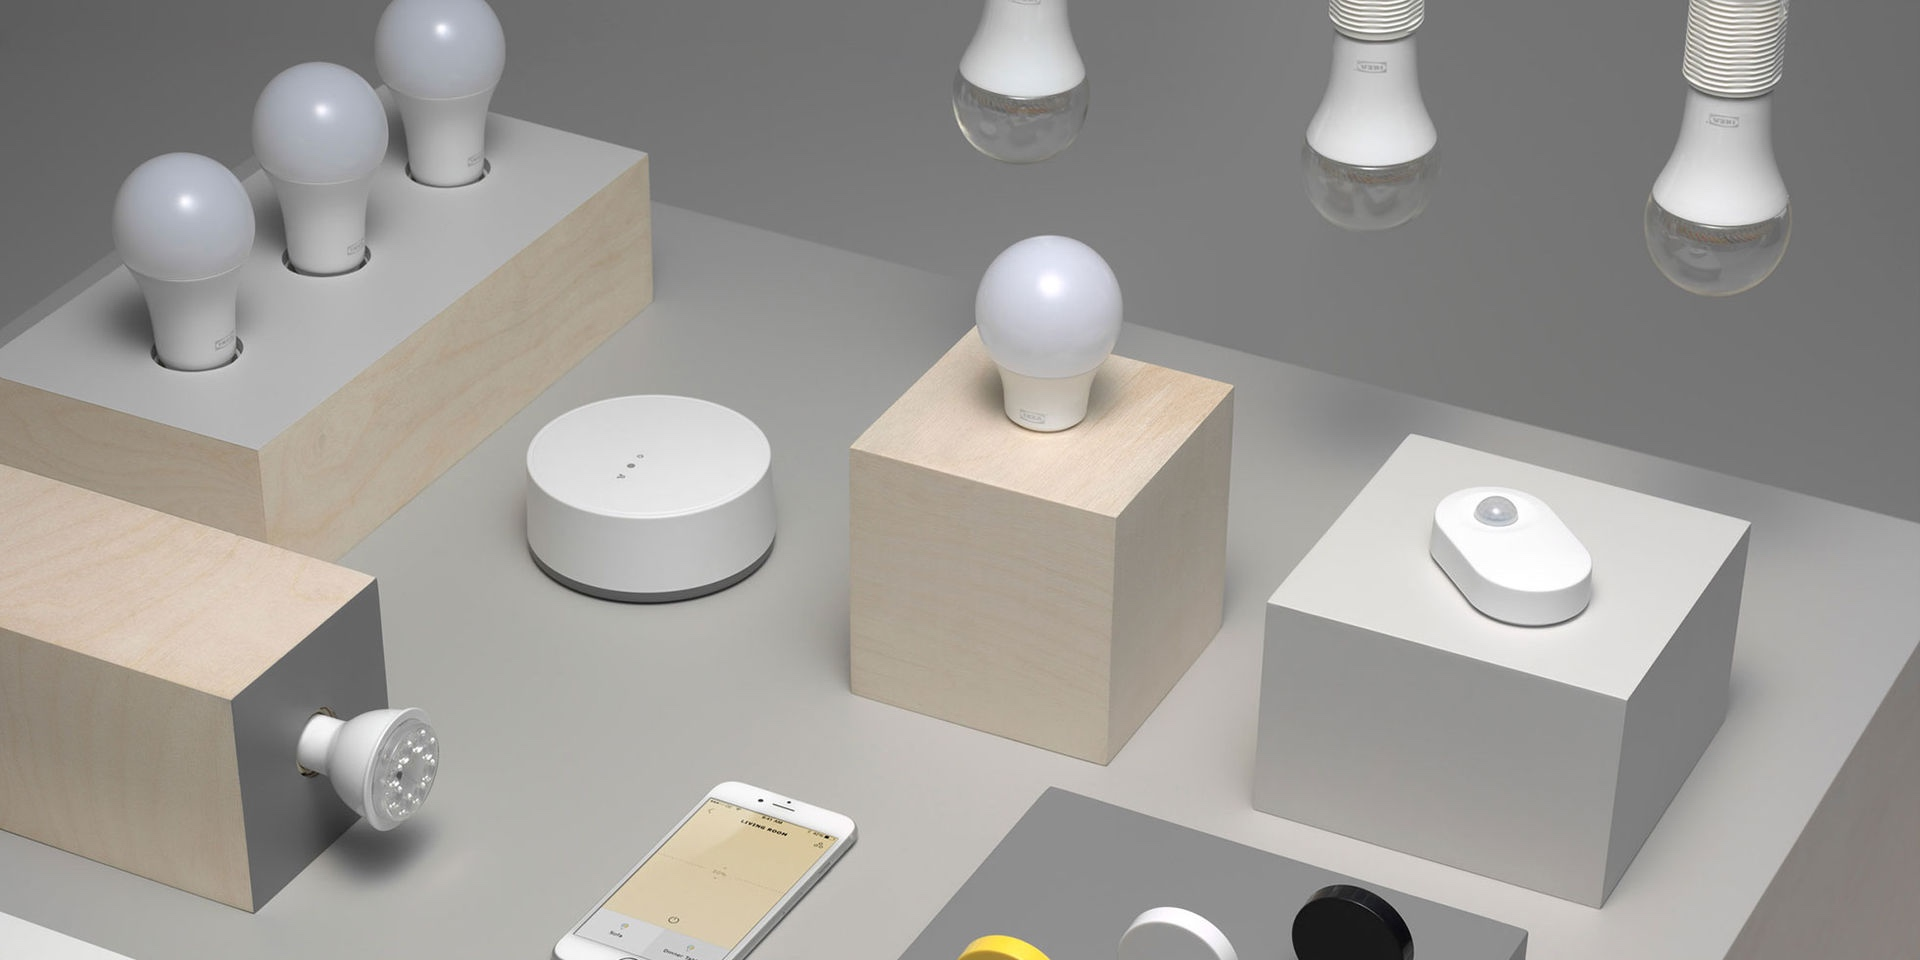 Tradfri Smart Lighting